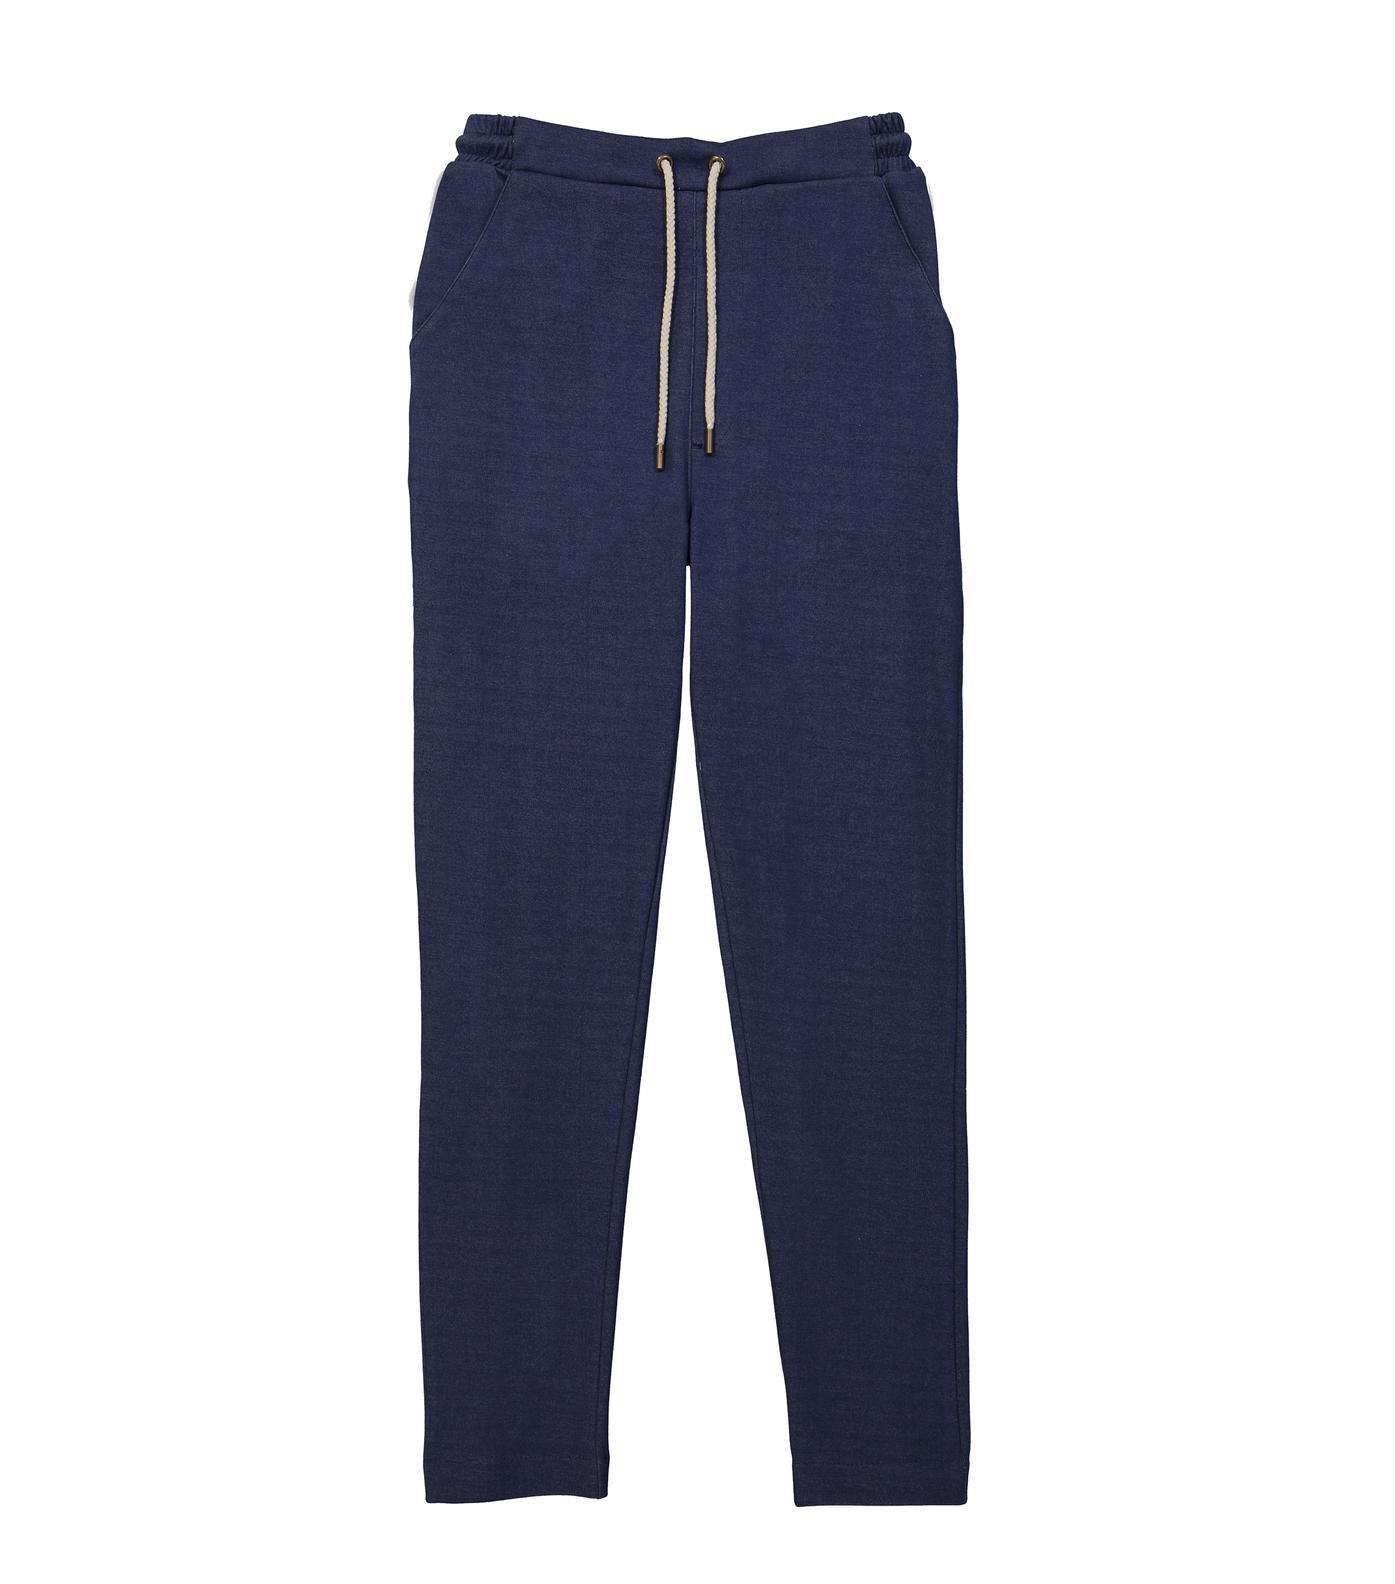 PANTS GN.DIM05 - Dark blue